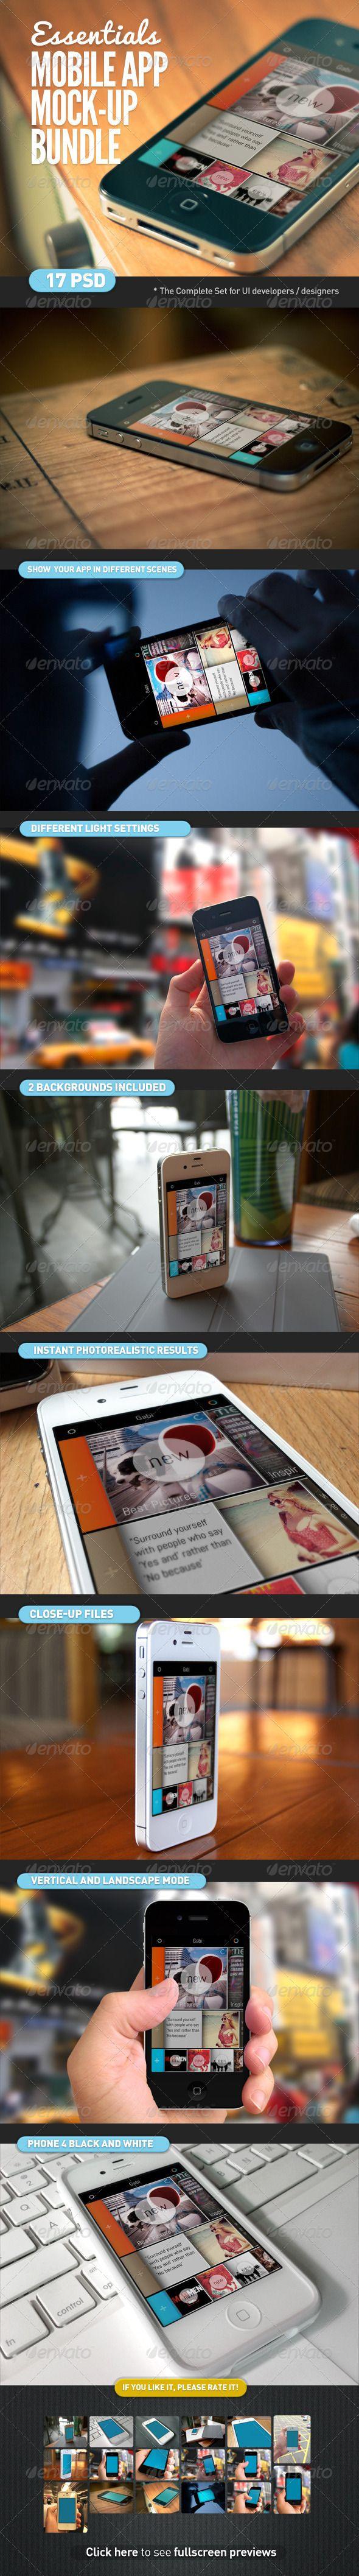 Mobile App   Screen Mock-Up Essentials Bundle